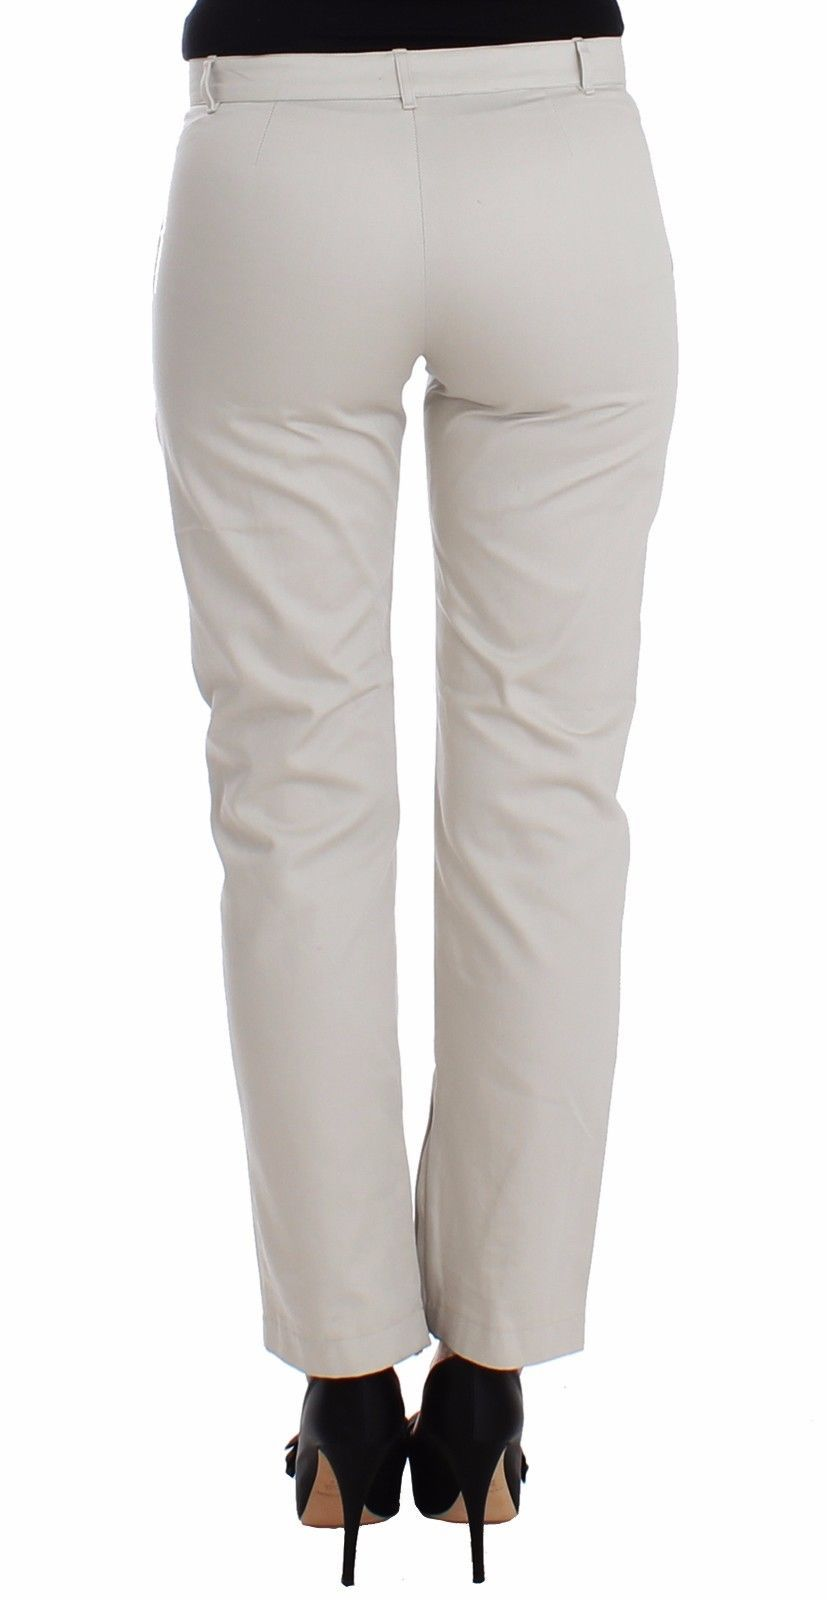 Ermanno Scervino Beige Dress Pants Slim Skinny Leg Cotton